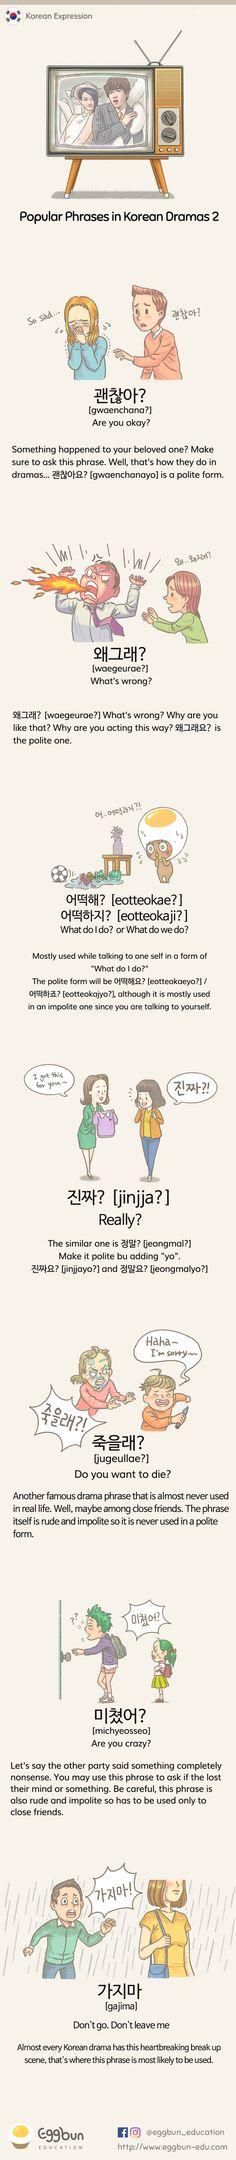 Chat to Learn Korean with Eggbun! Learn Basic Korean, How To Speak Korean, Korean Words Learning, Korean Language Learning, Korean Phrases, Korean Quotes, Fox M, Learn Korean Alphabet, Learning Languages Tips